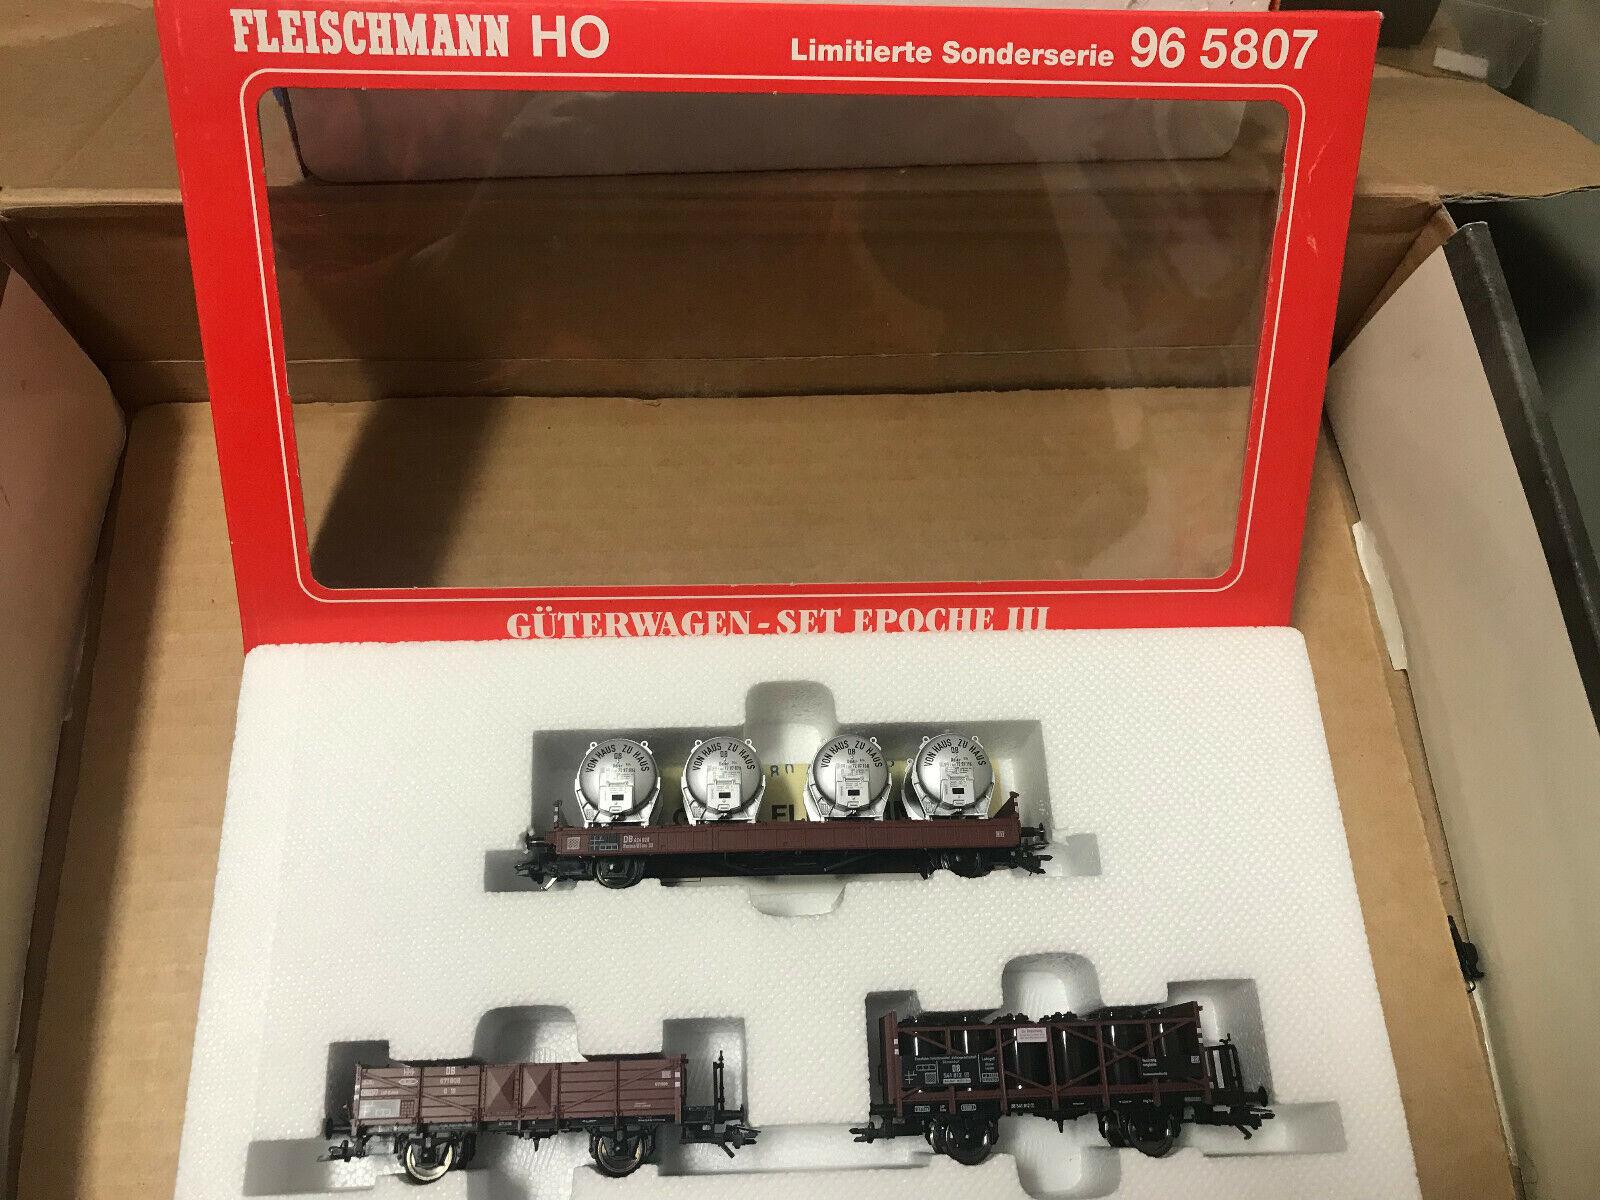 Fleischuomon 96 5807 h0 serie specialee autori merciSet DBepoca 3 NUOVO  OVP